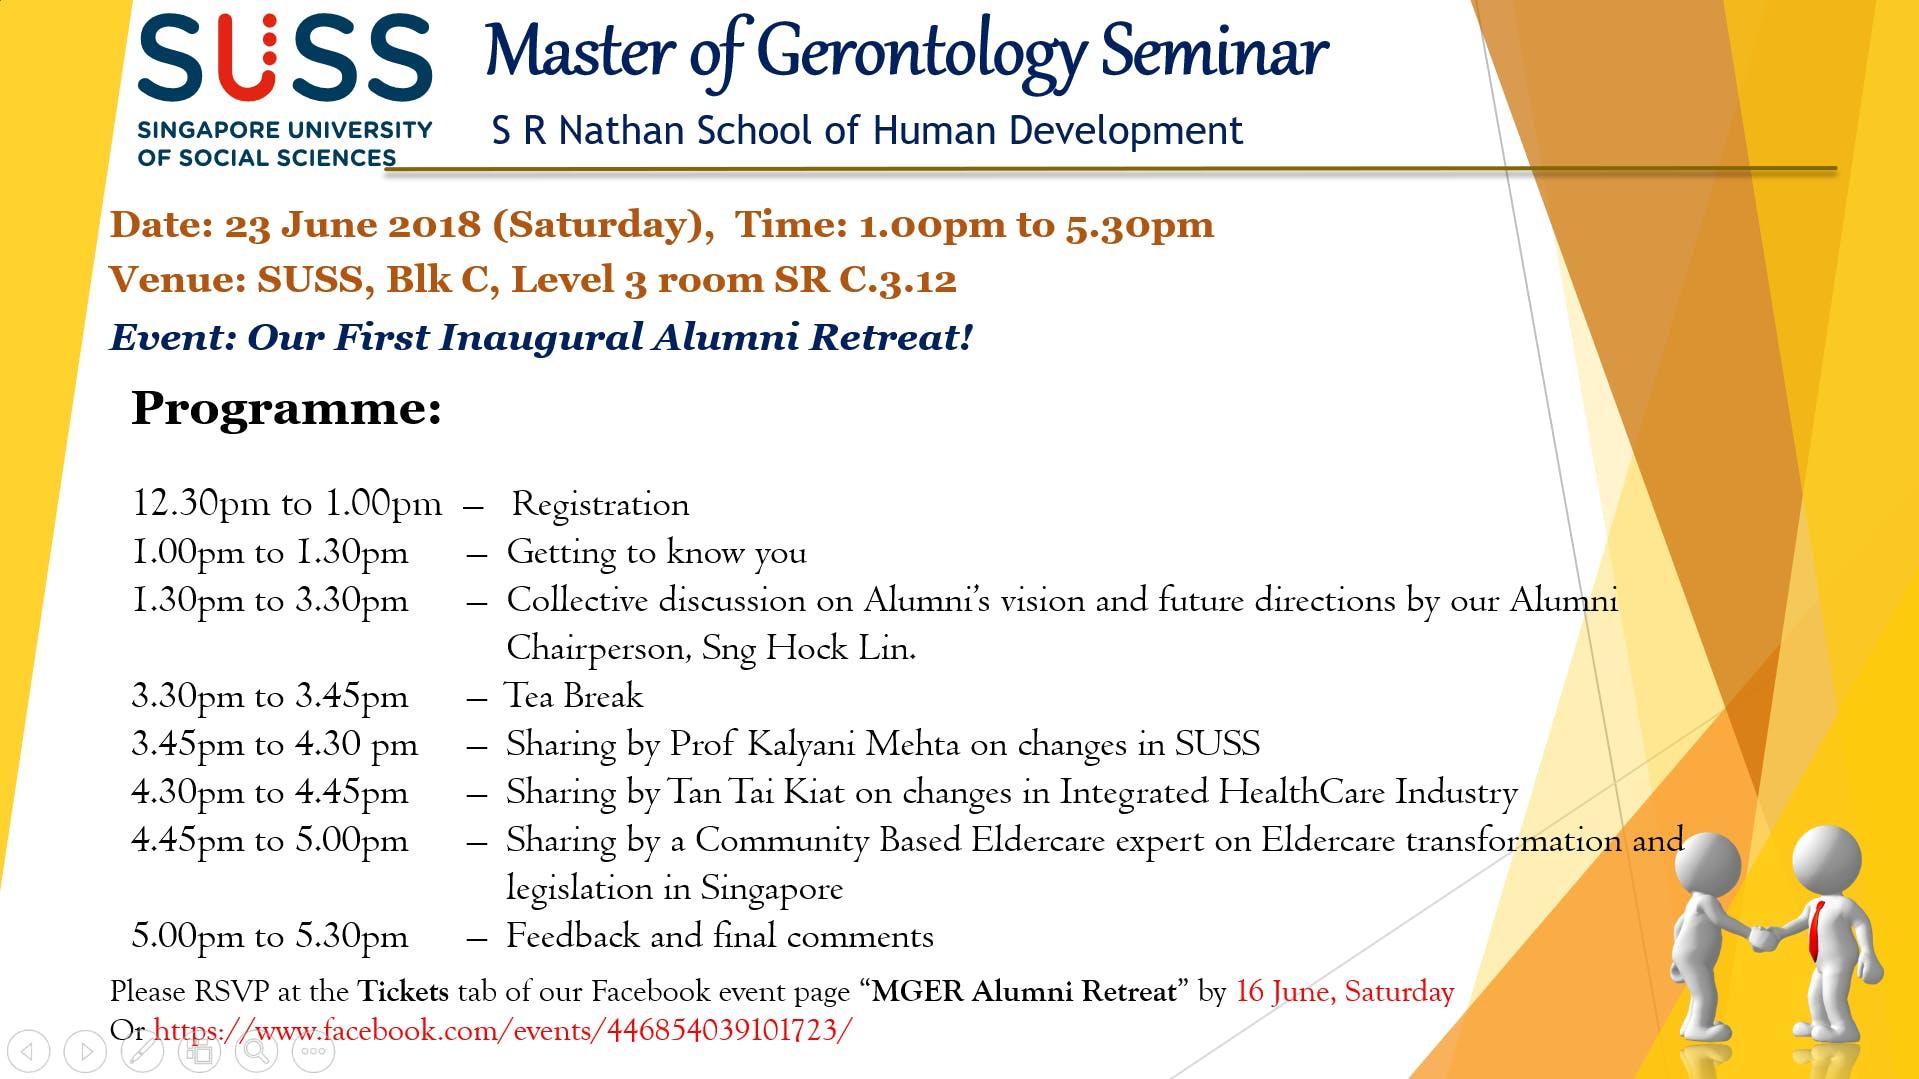 MGER Alumni Retreat